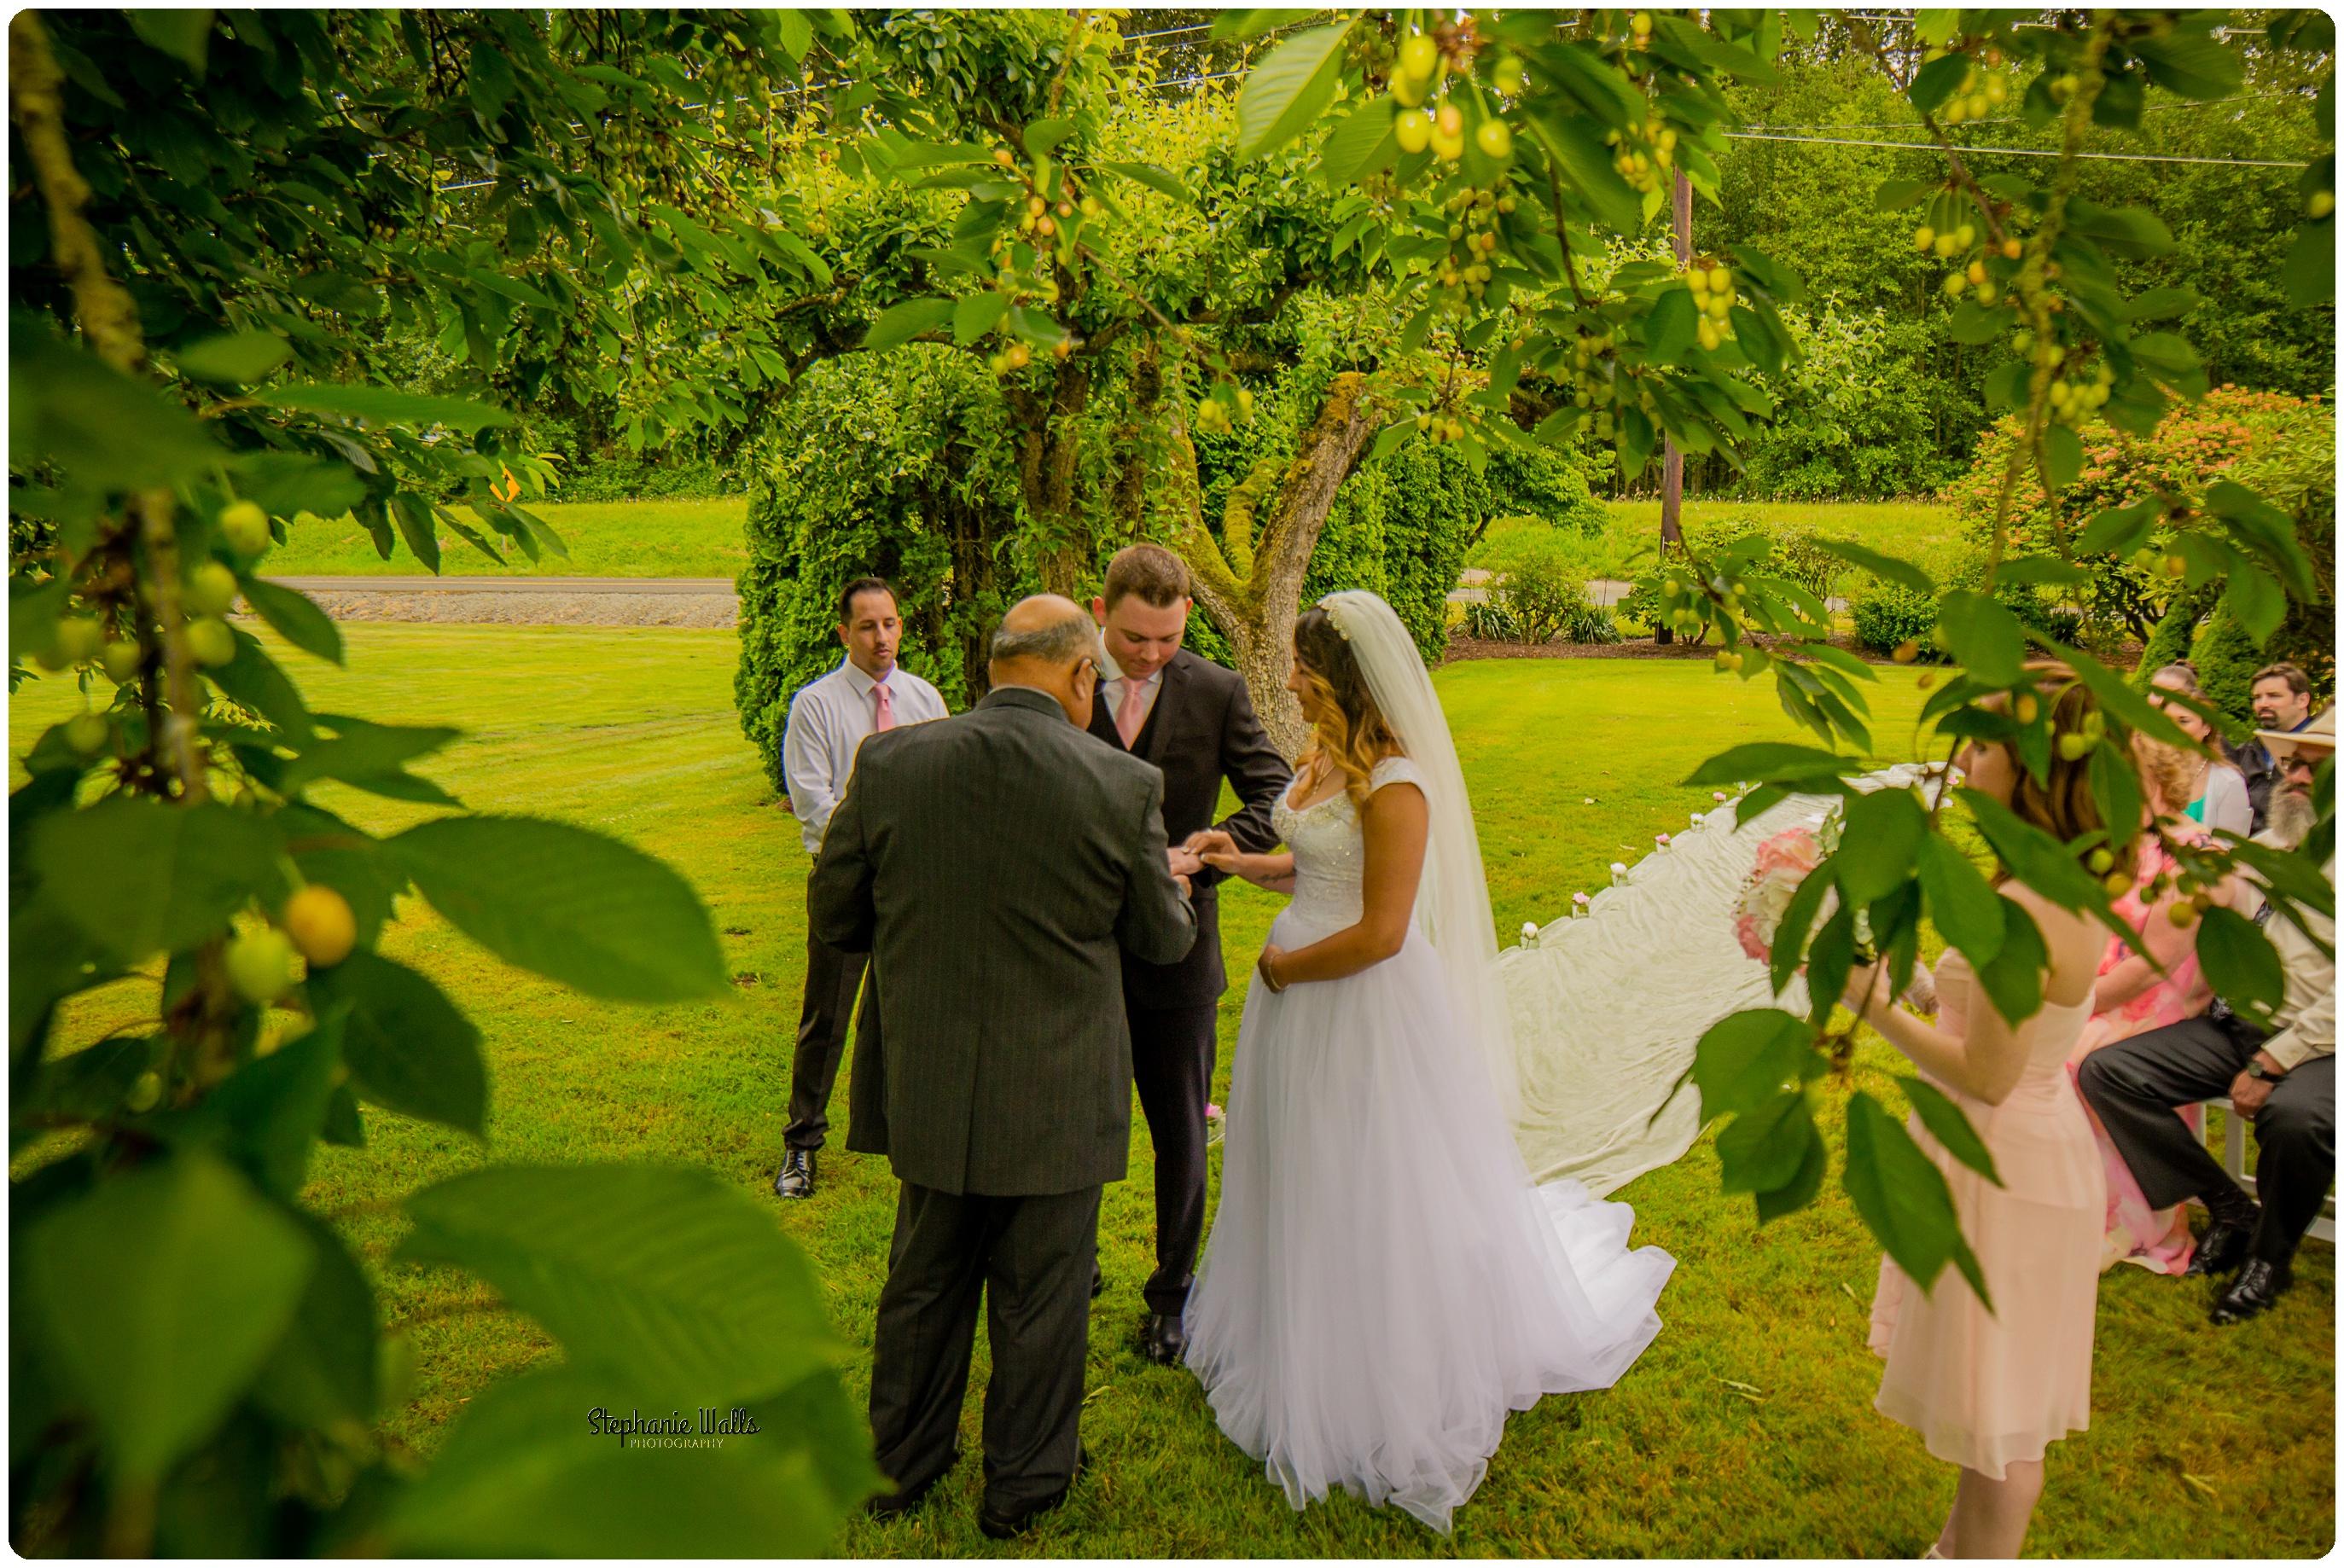 Miller Wedding123 WHERE EVER YOU GO | MAPLEHURST FARMS GUESTHOUSE | STEPHANIE WALLS PHOTOGRAPHY